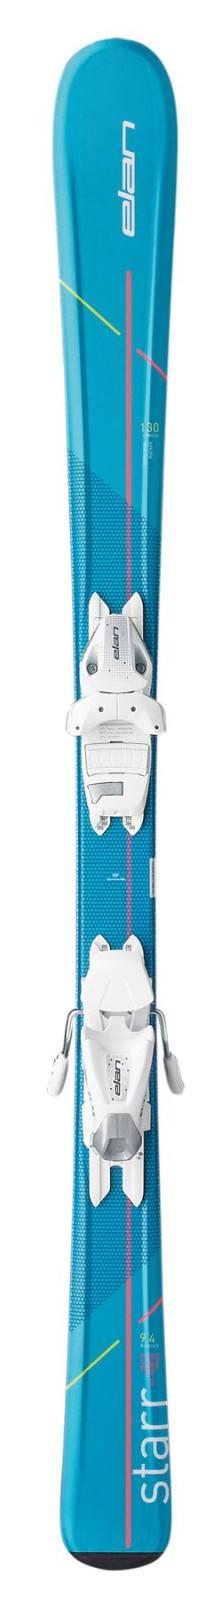 Juniorské sjezdové lyže ElanStarr Quick Shift